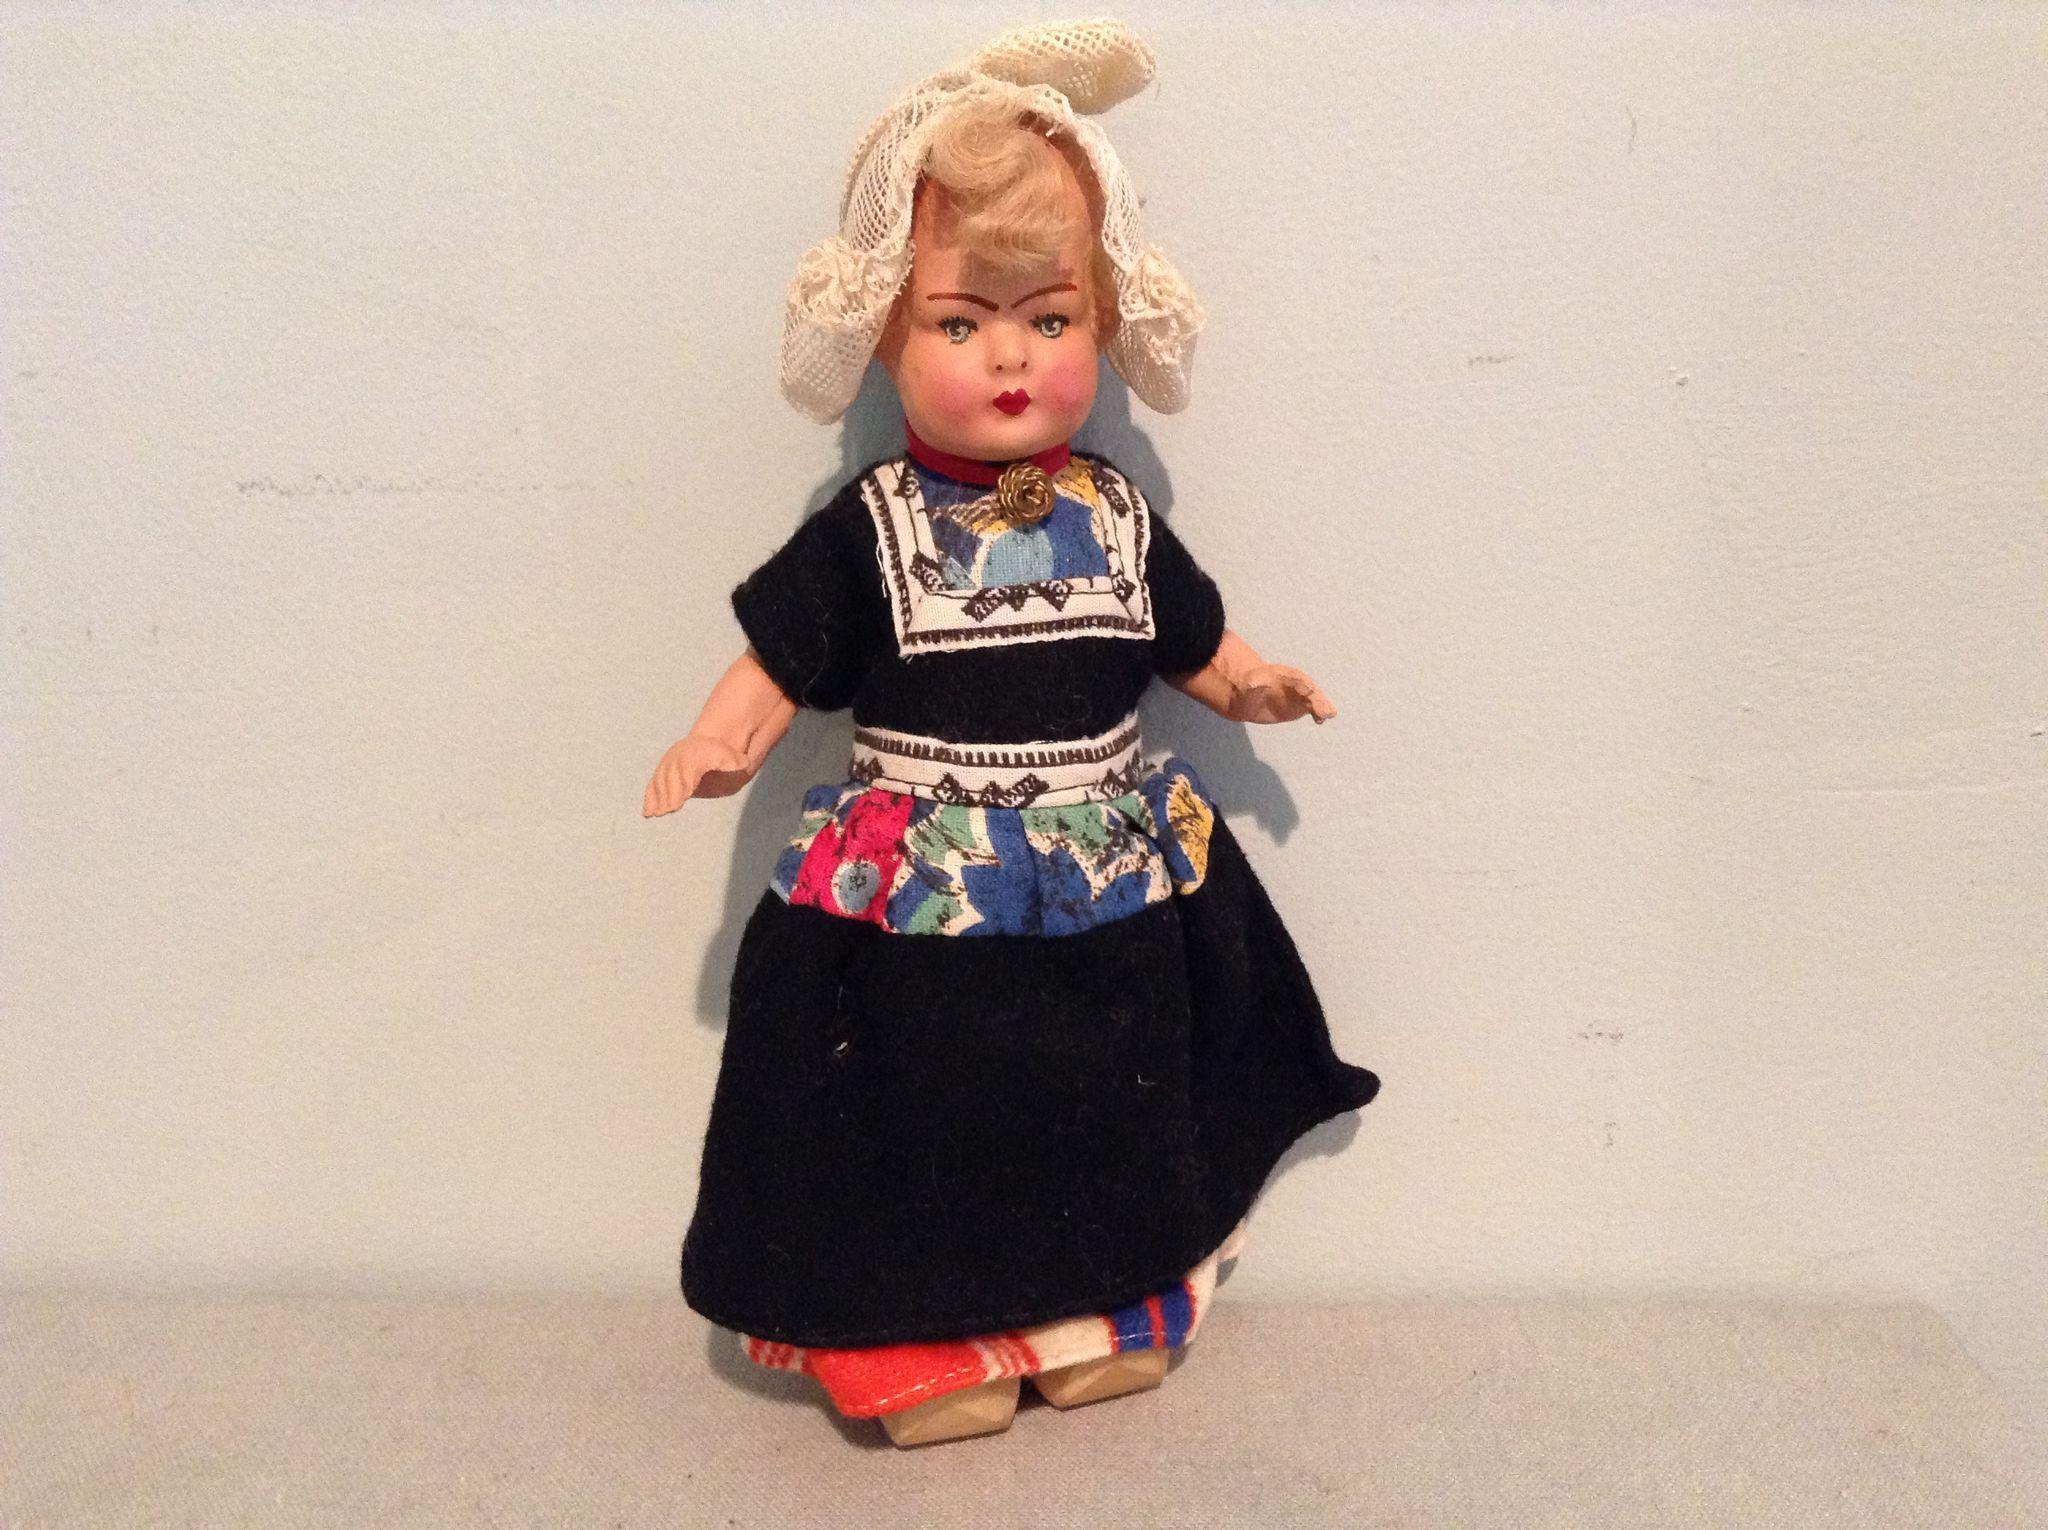 Deco Era Composition Dutch Doll in Factory Garb.